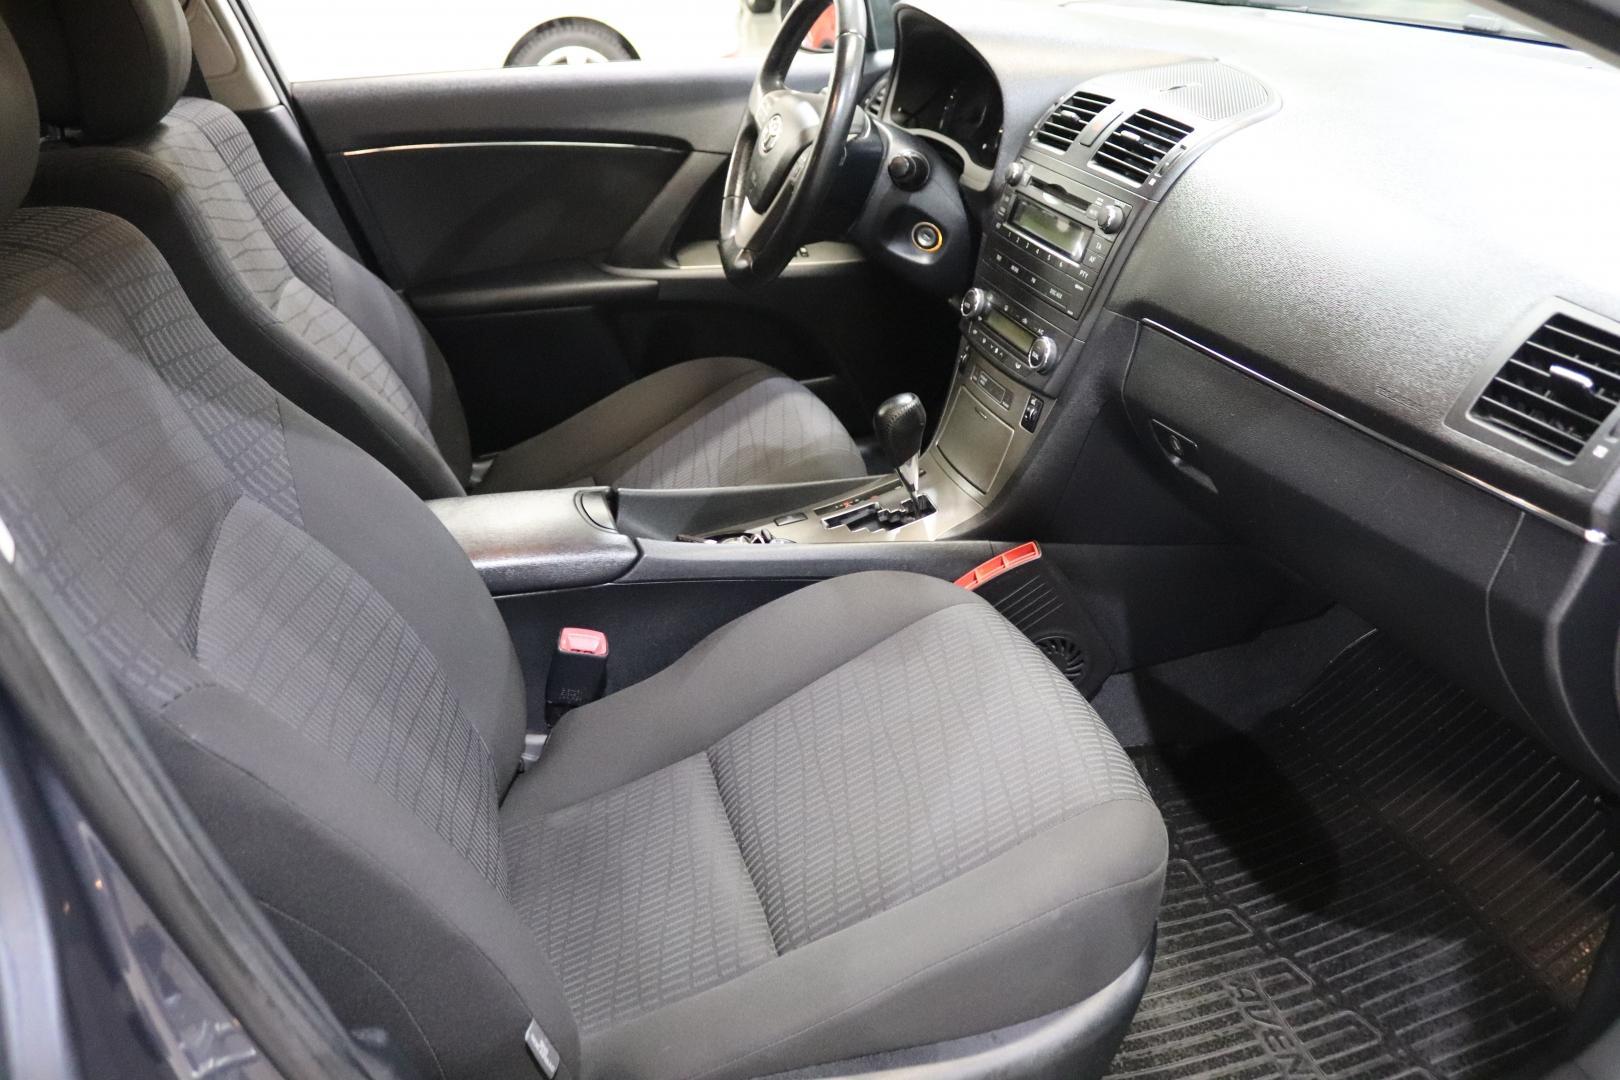 Toyota Avensis, 1.8 Valvematic Sol Wagon MultidriveS